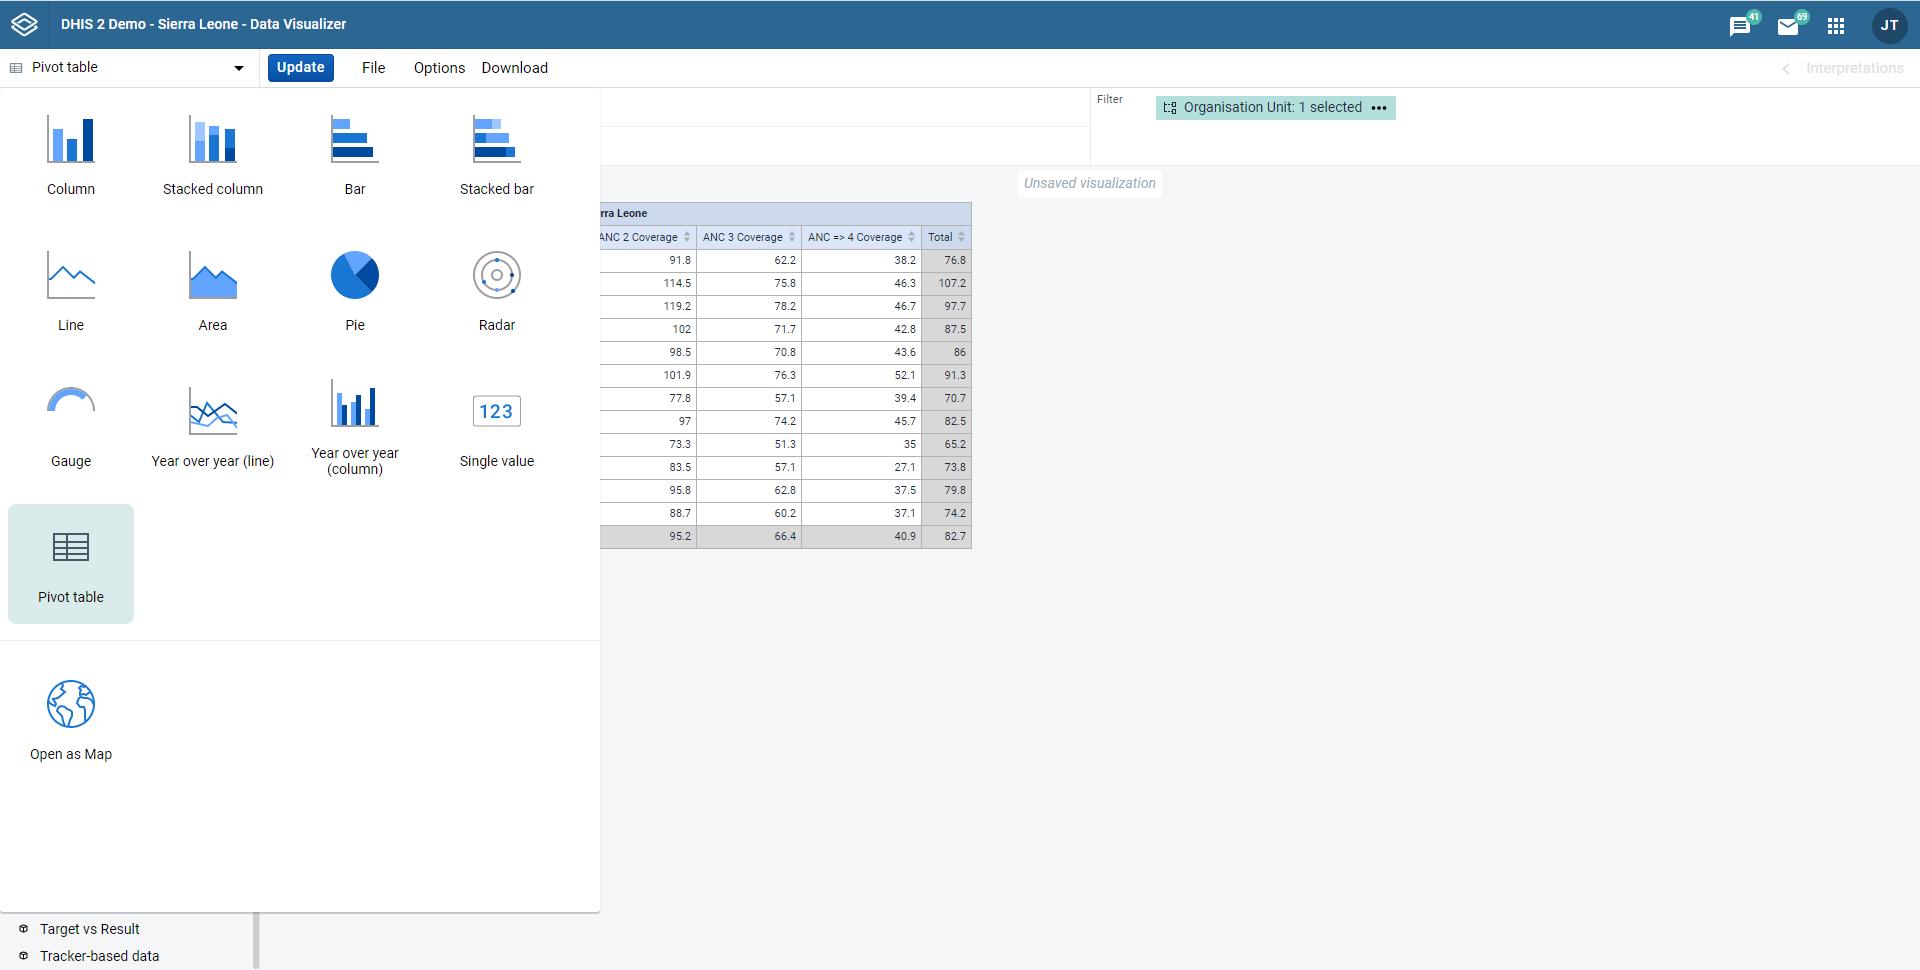 Pivot tables in Data visualizer app